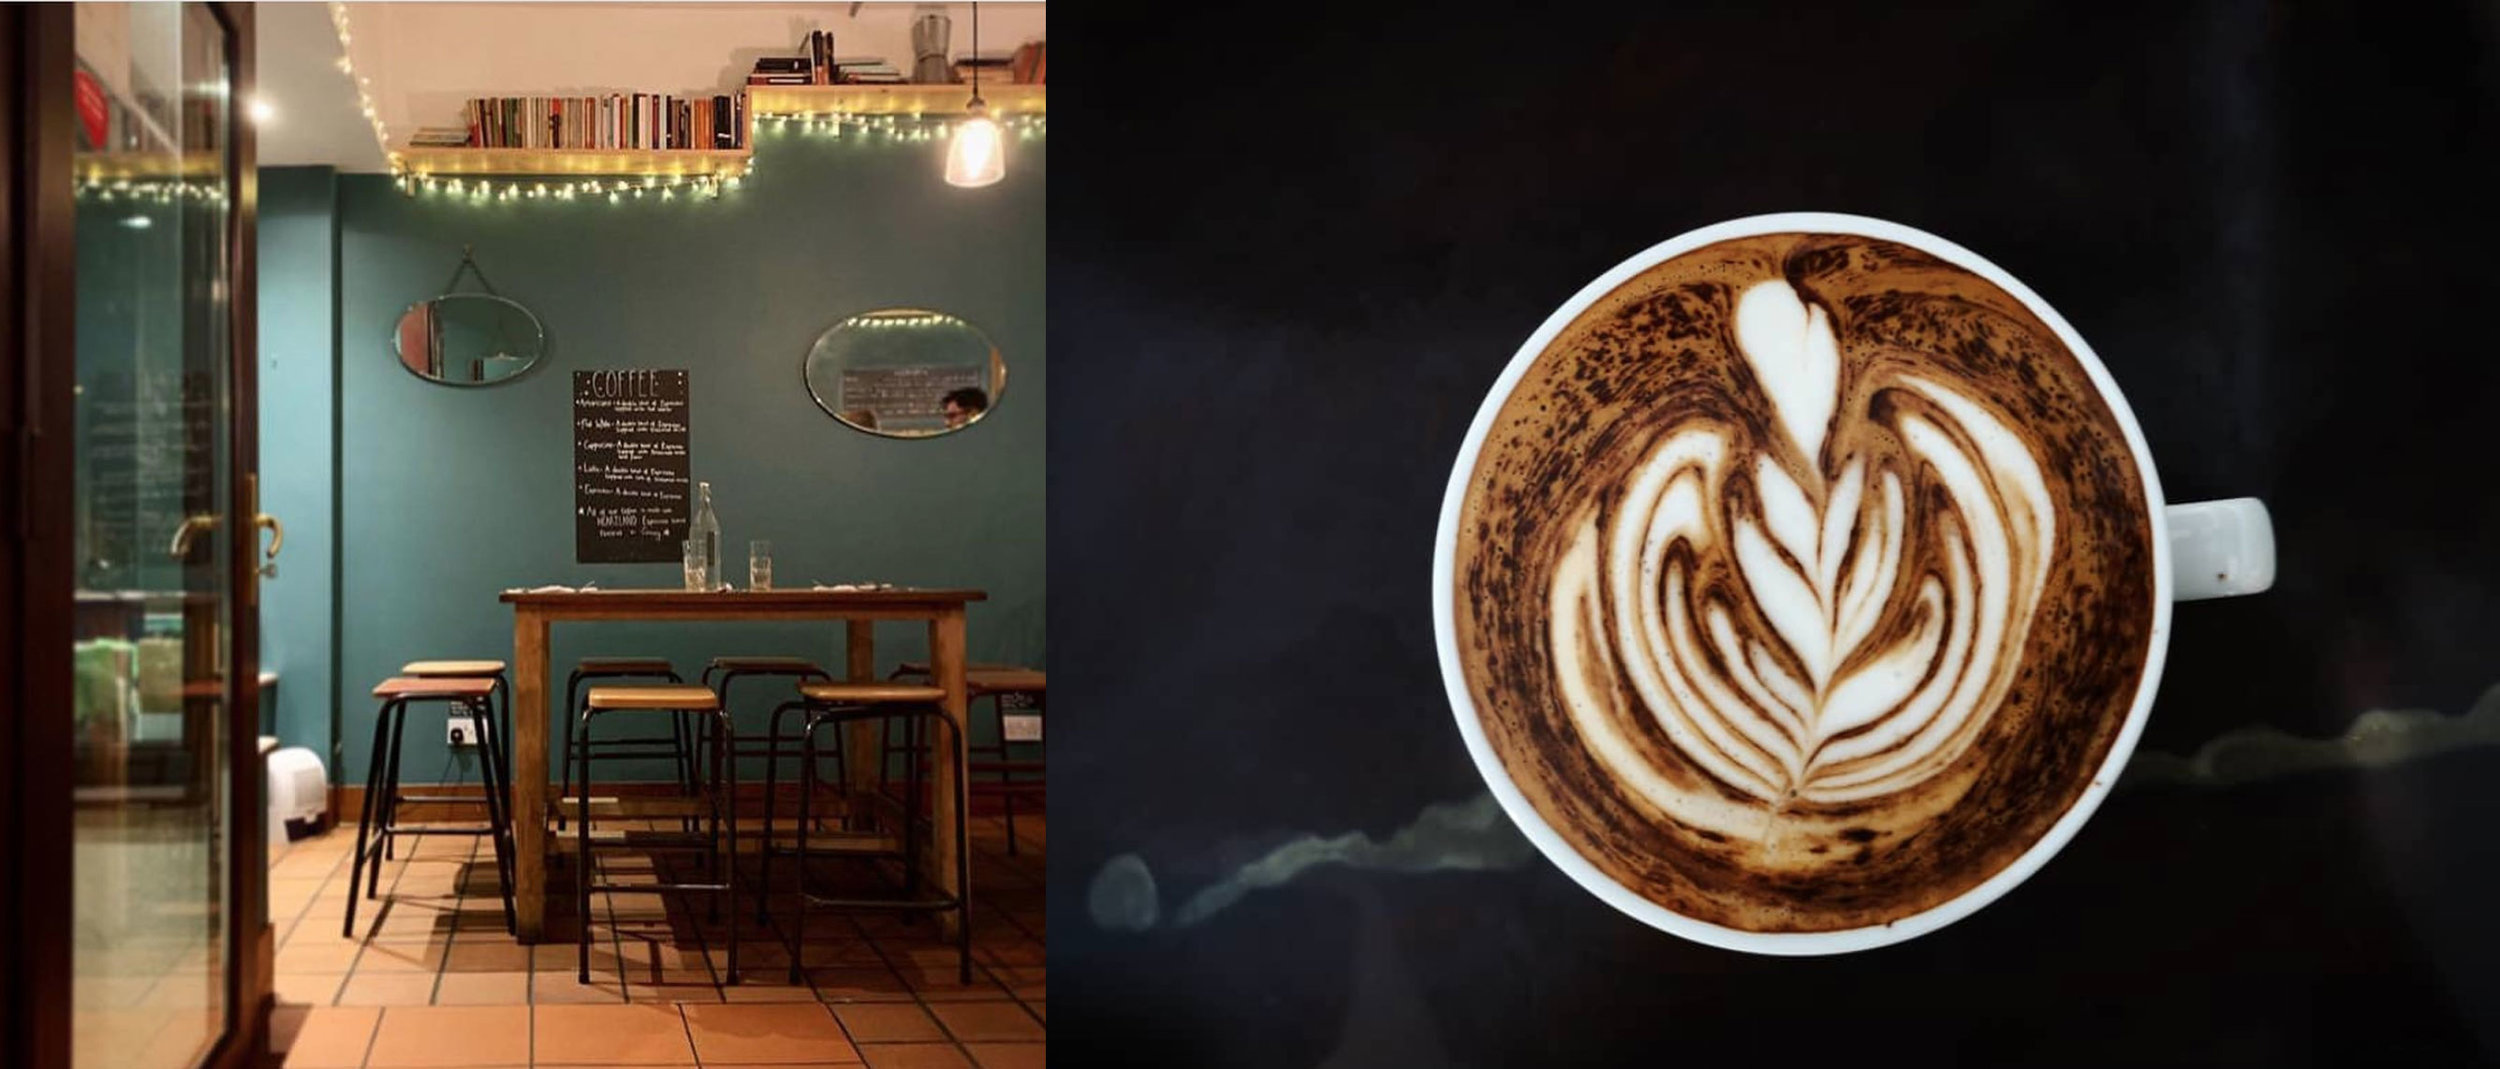 Watch Llanberis go by from Mafon cafe serving Heartland Coffi